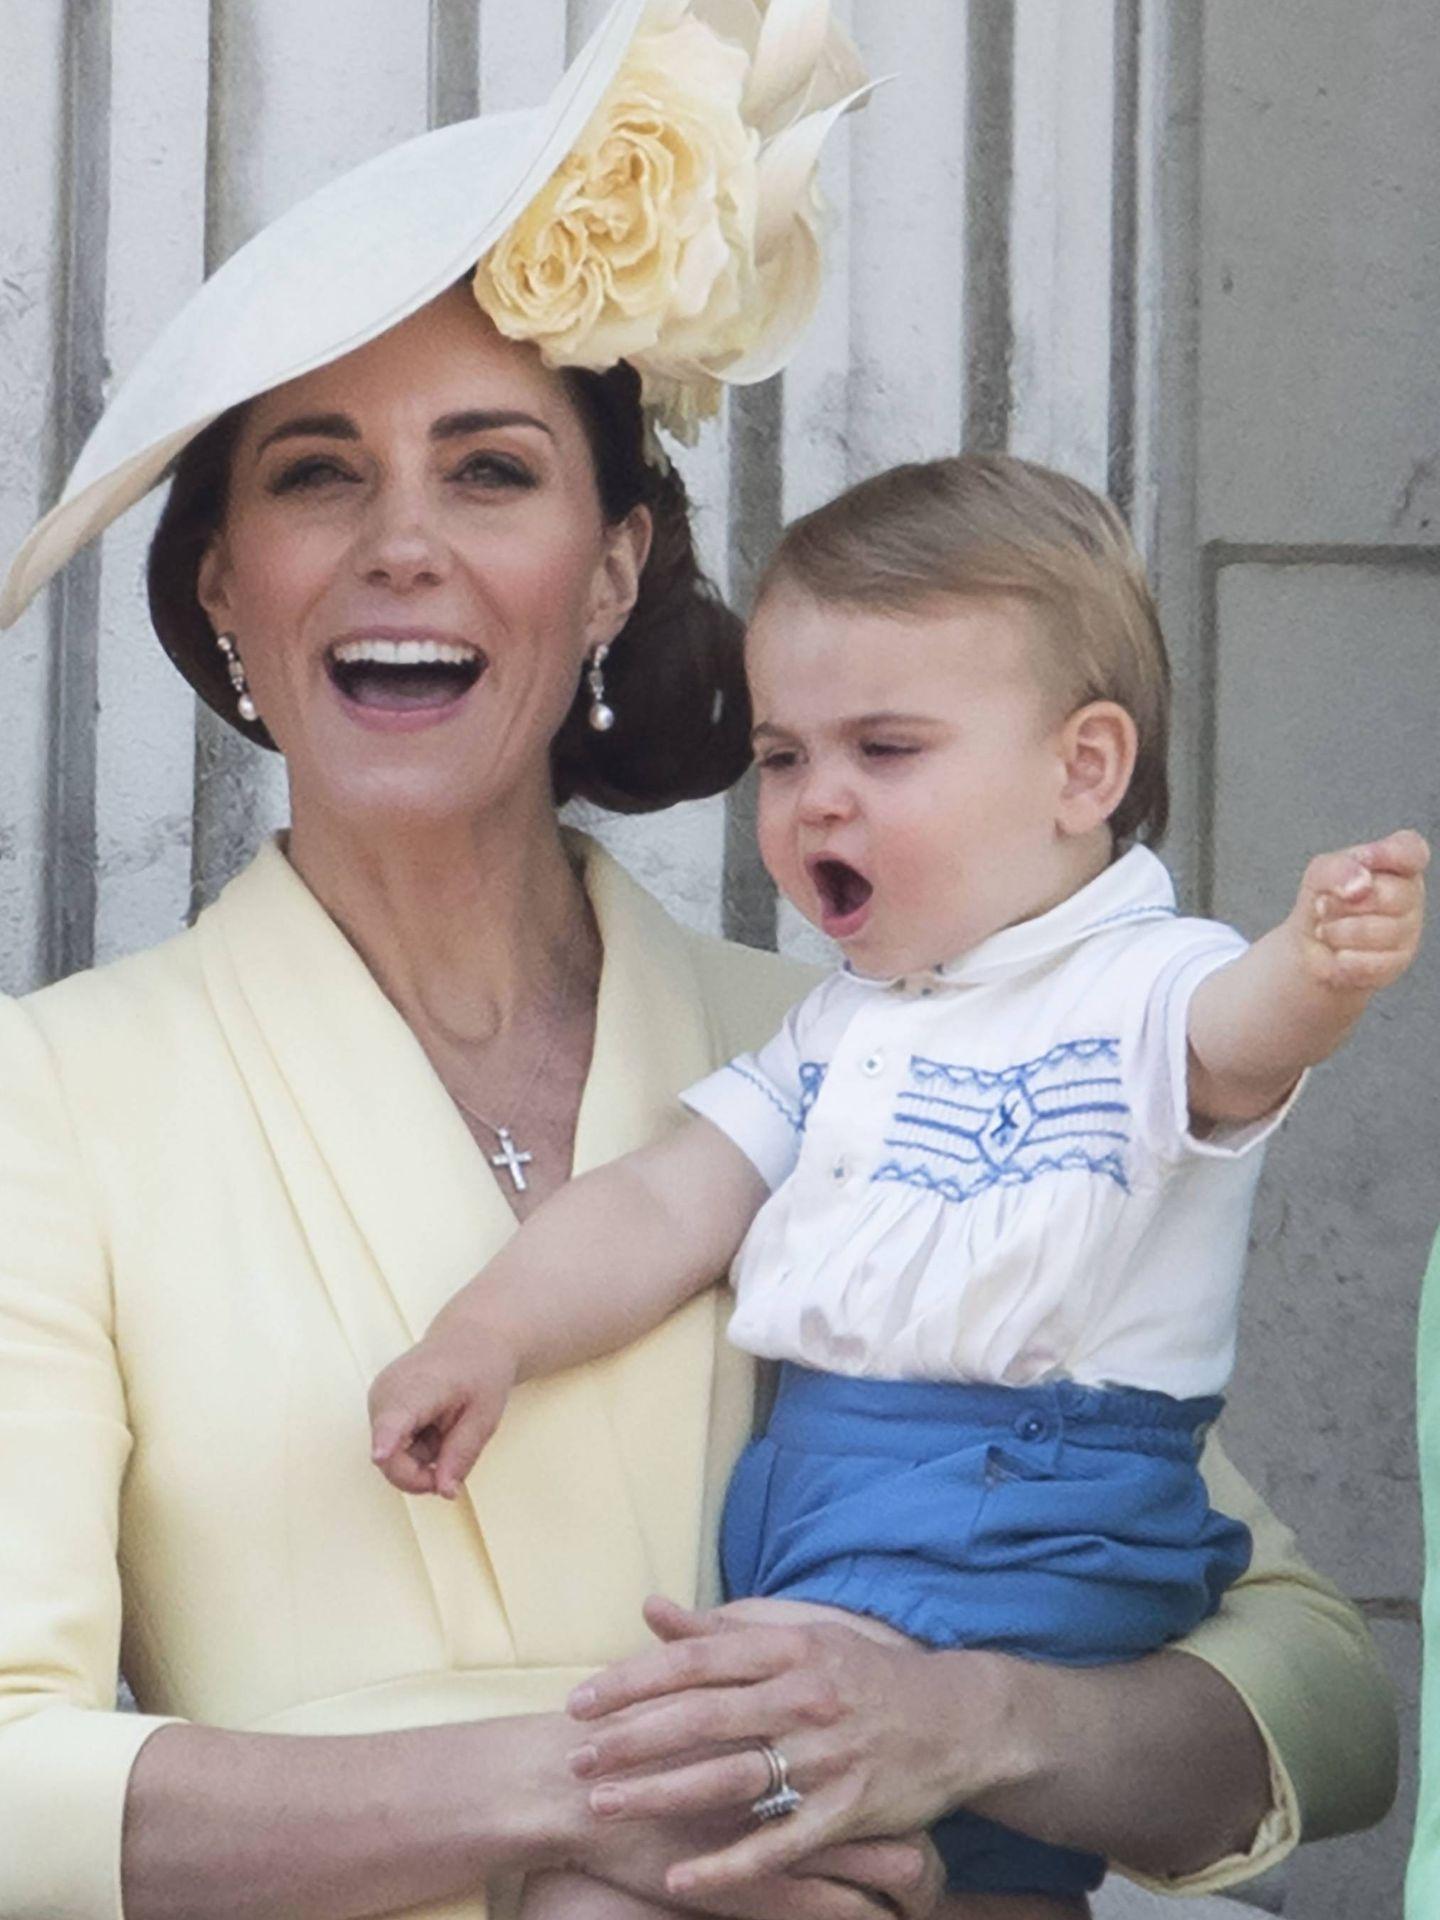 La duquesa, en el Trooping the Colour. (Getty)